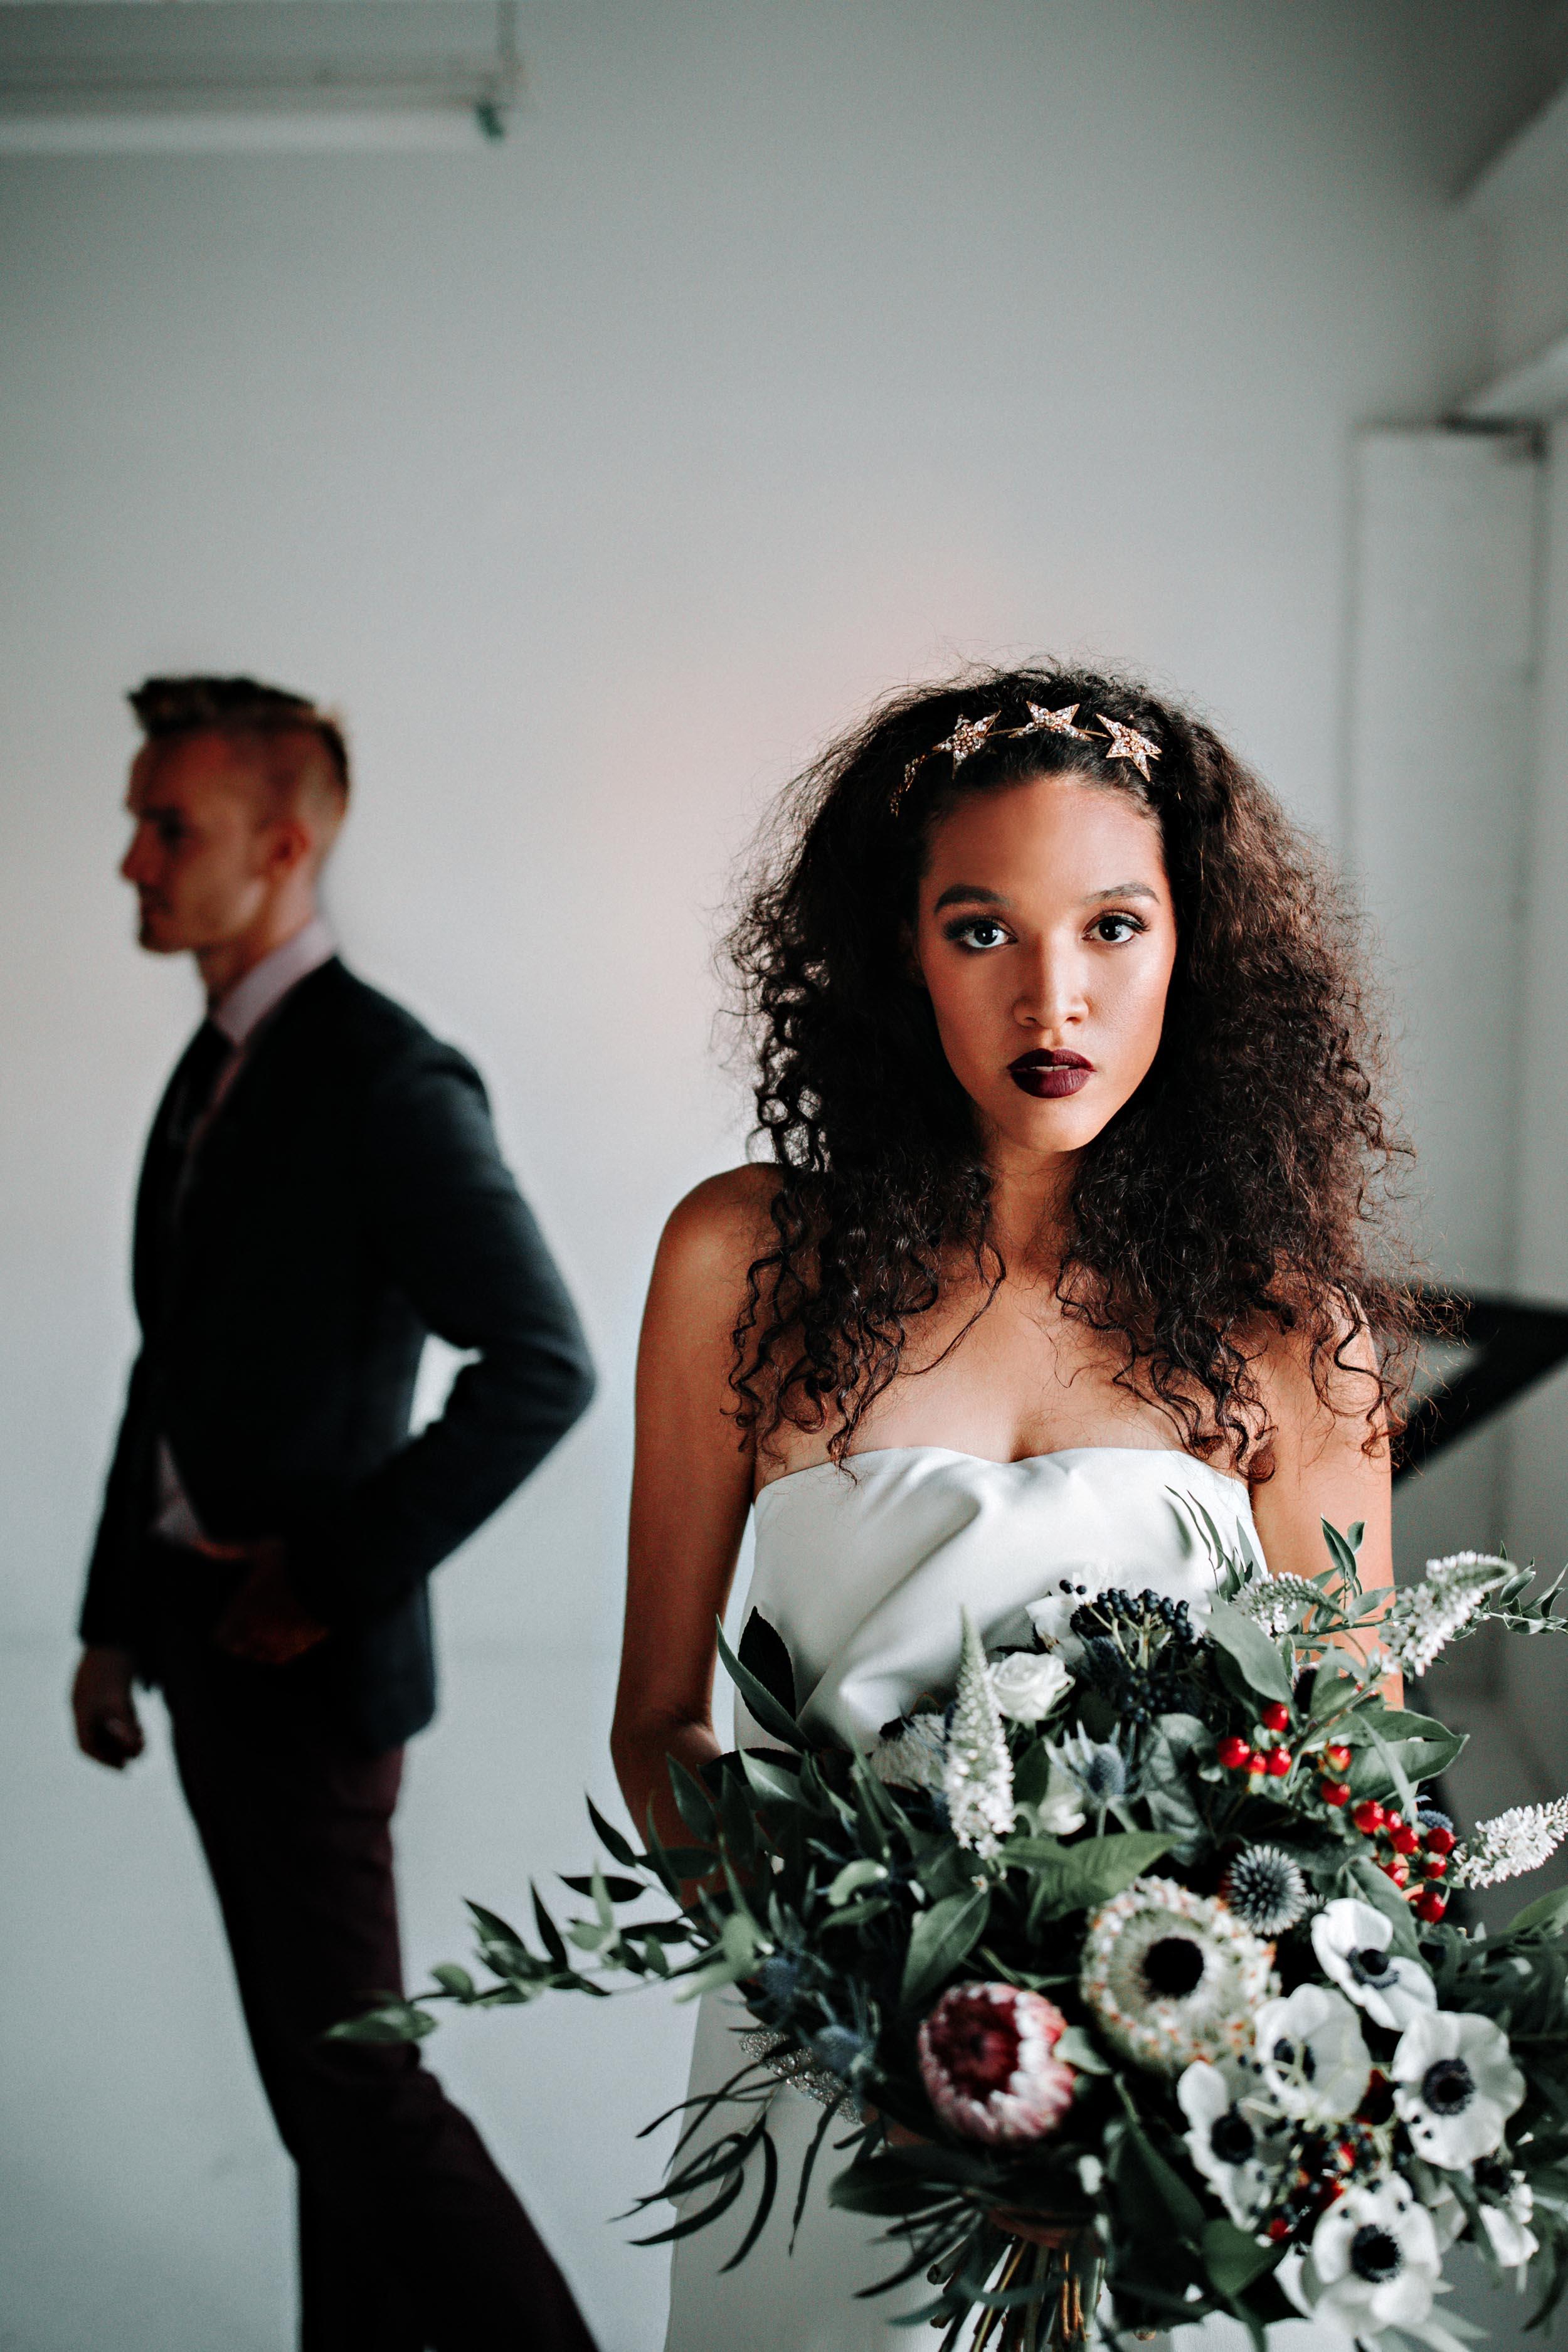 weddings-starsstripes-05.jpg